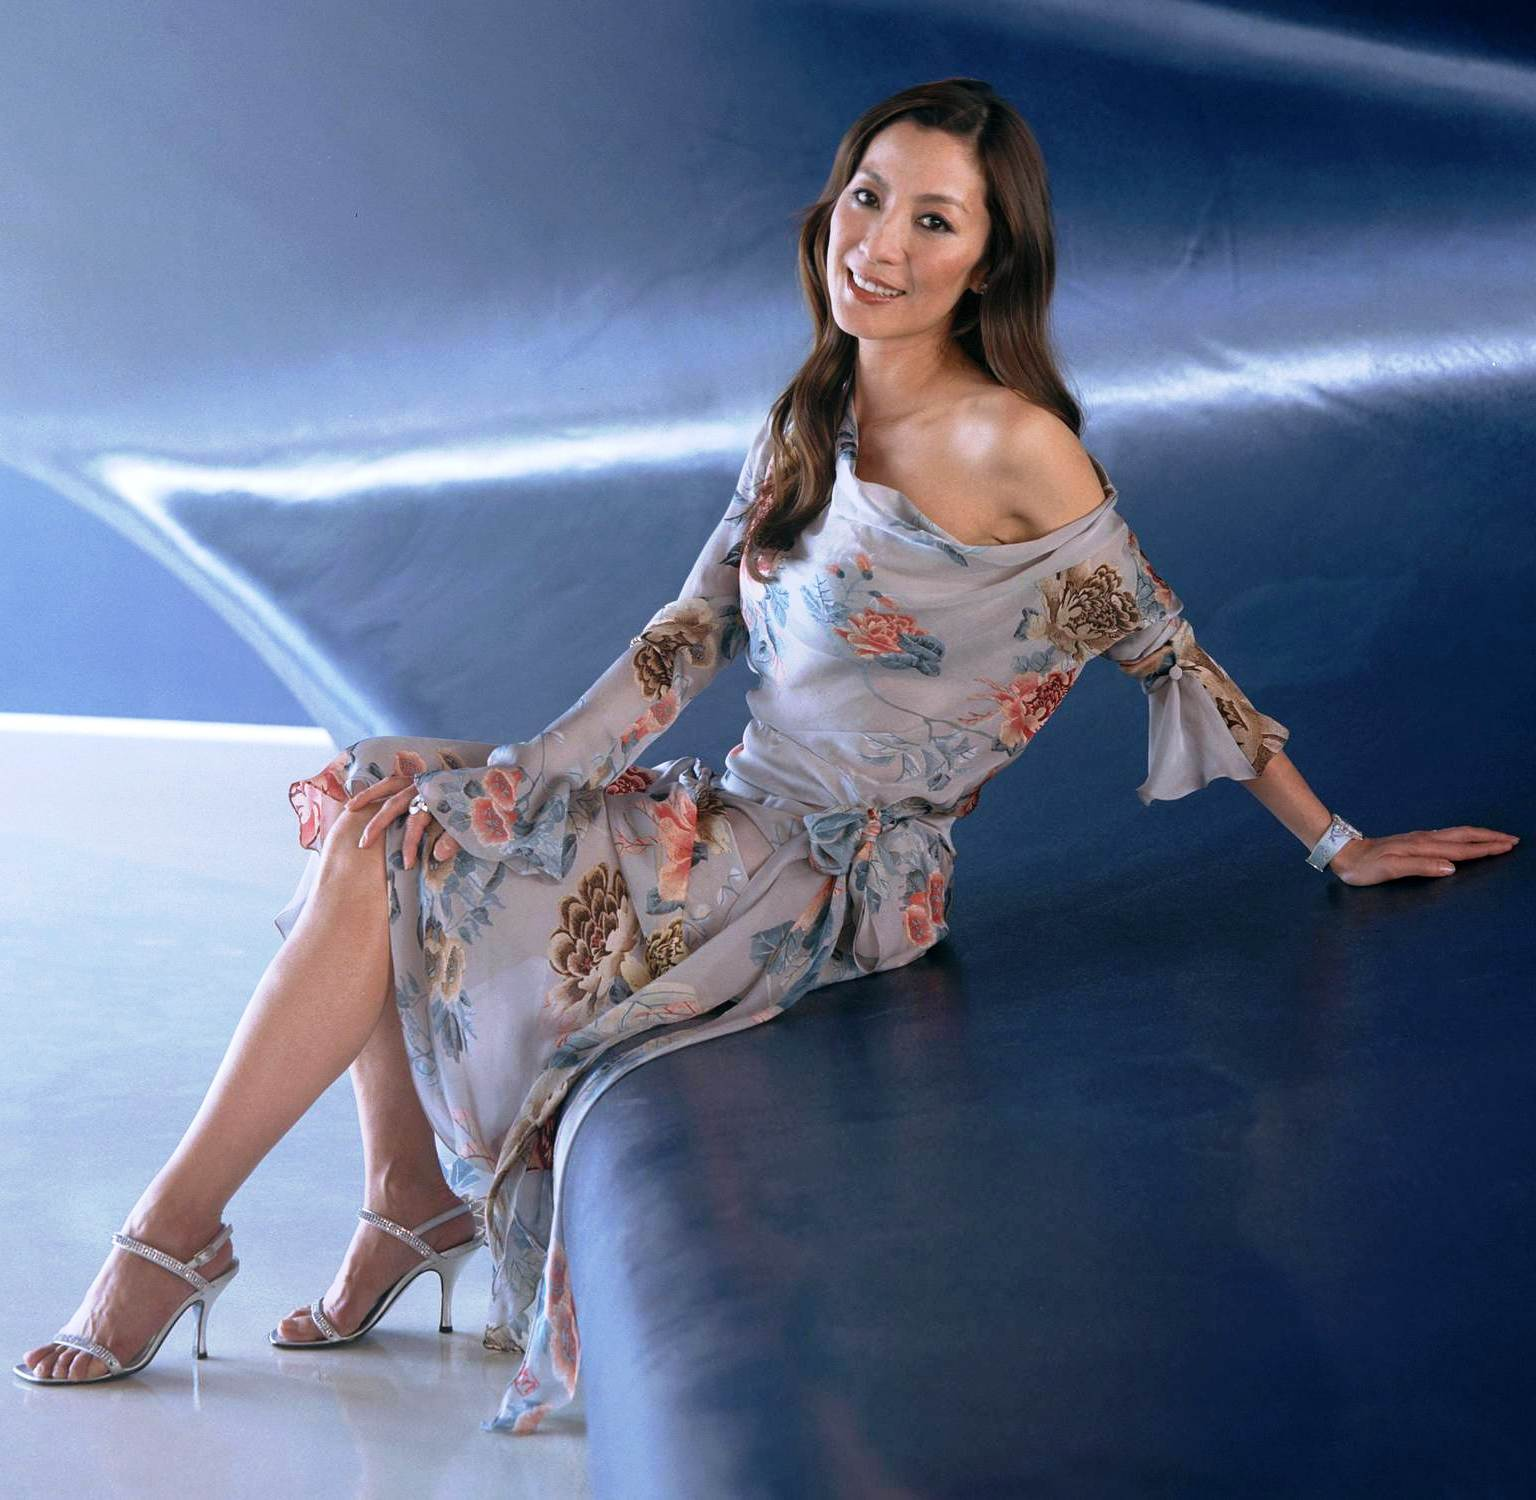 Michelle Yeoh Choo-Kheng (杨紫琼, Yáng zǐ qióng), 'Crazy Rich Asians' as Eleanor Young